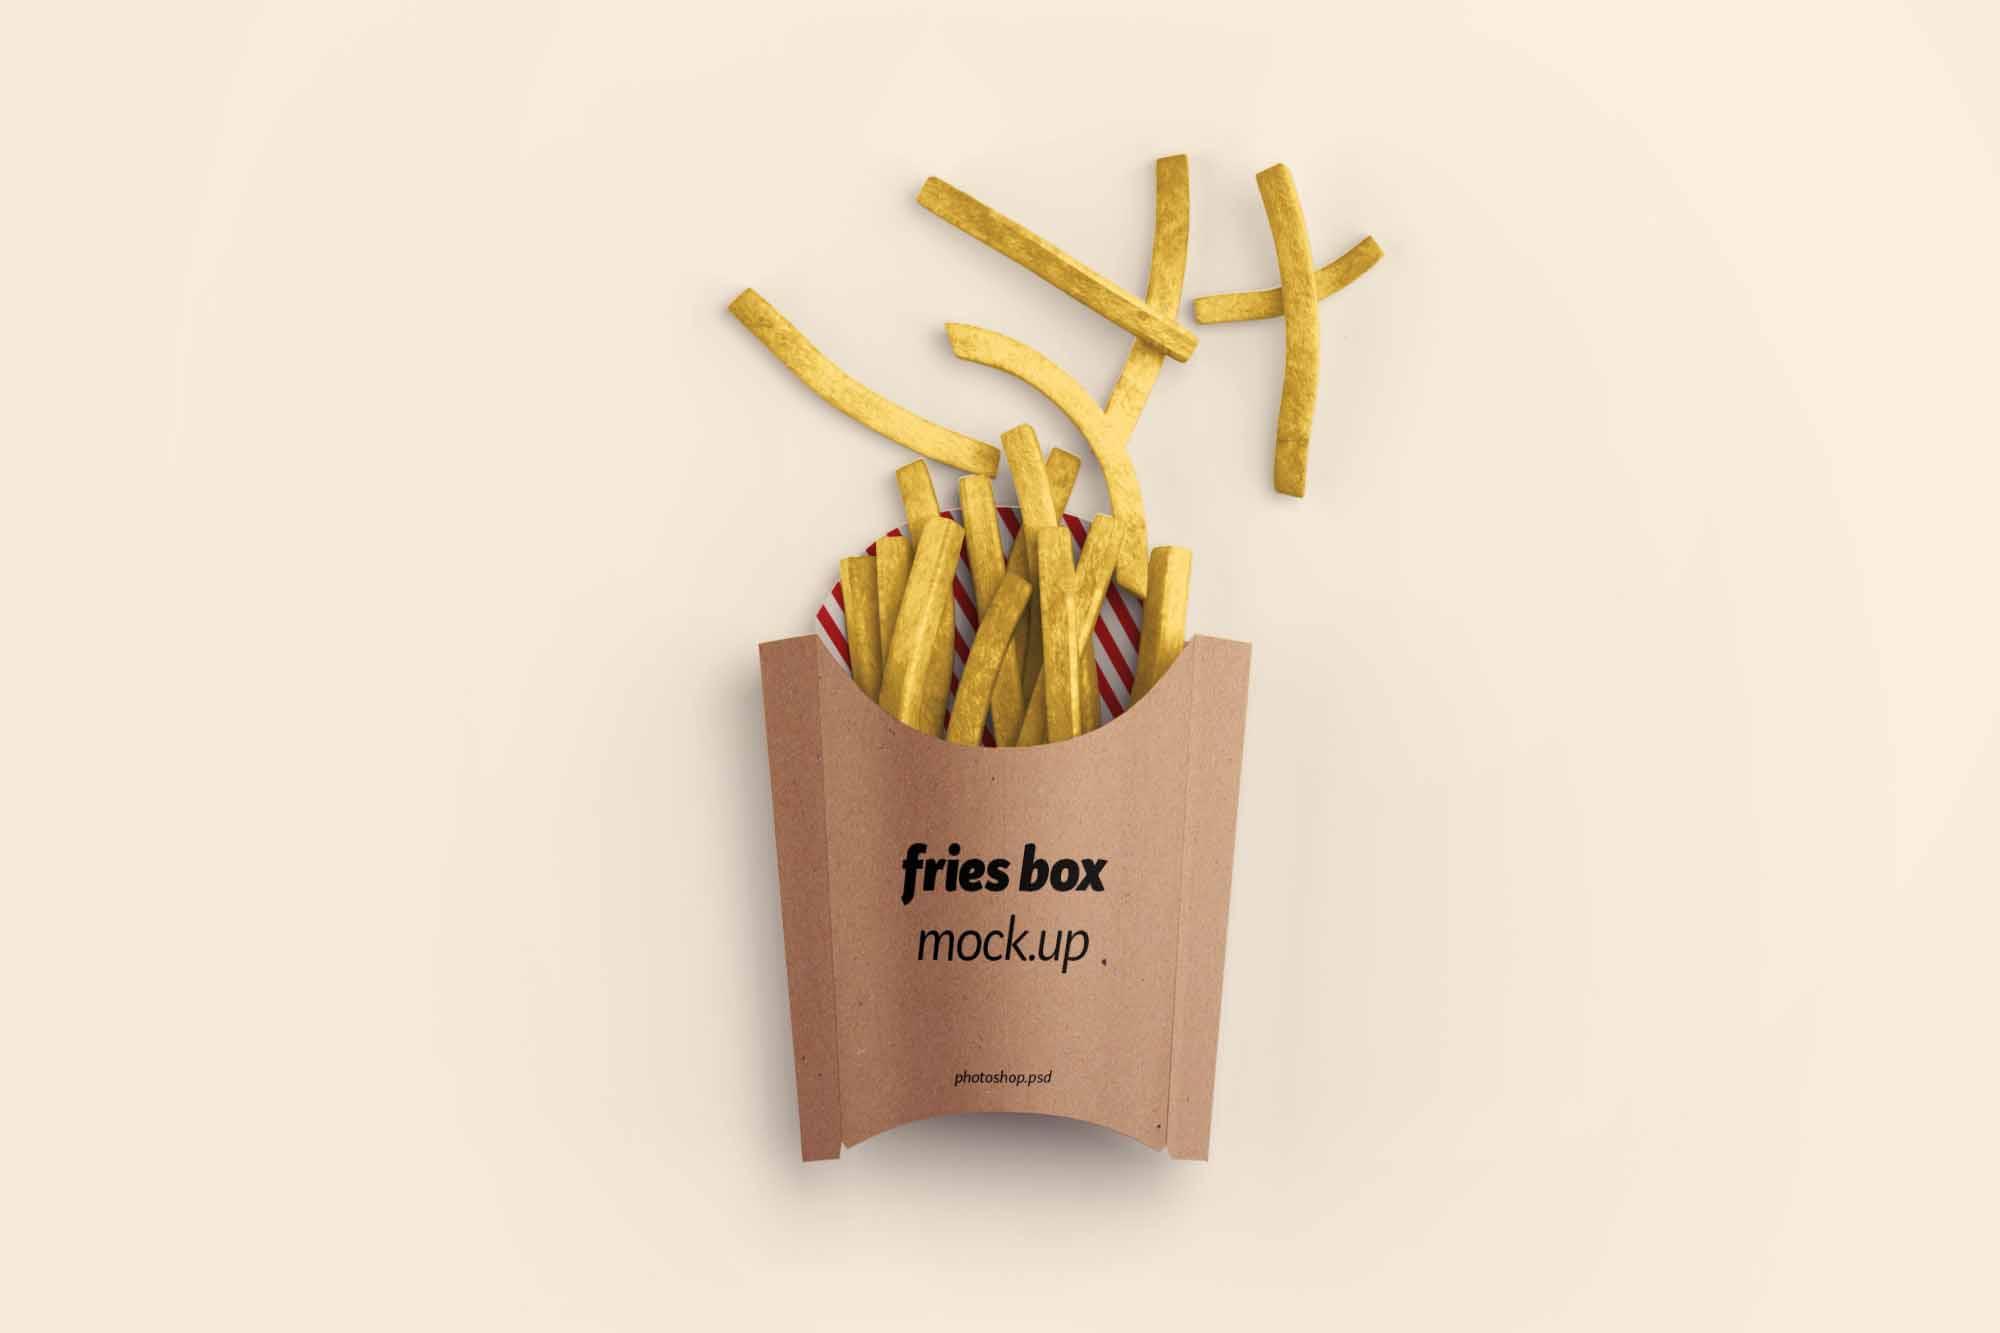 Fries Box Mockup